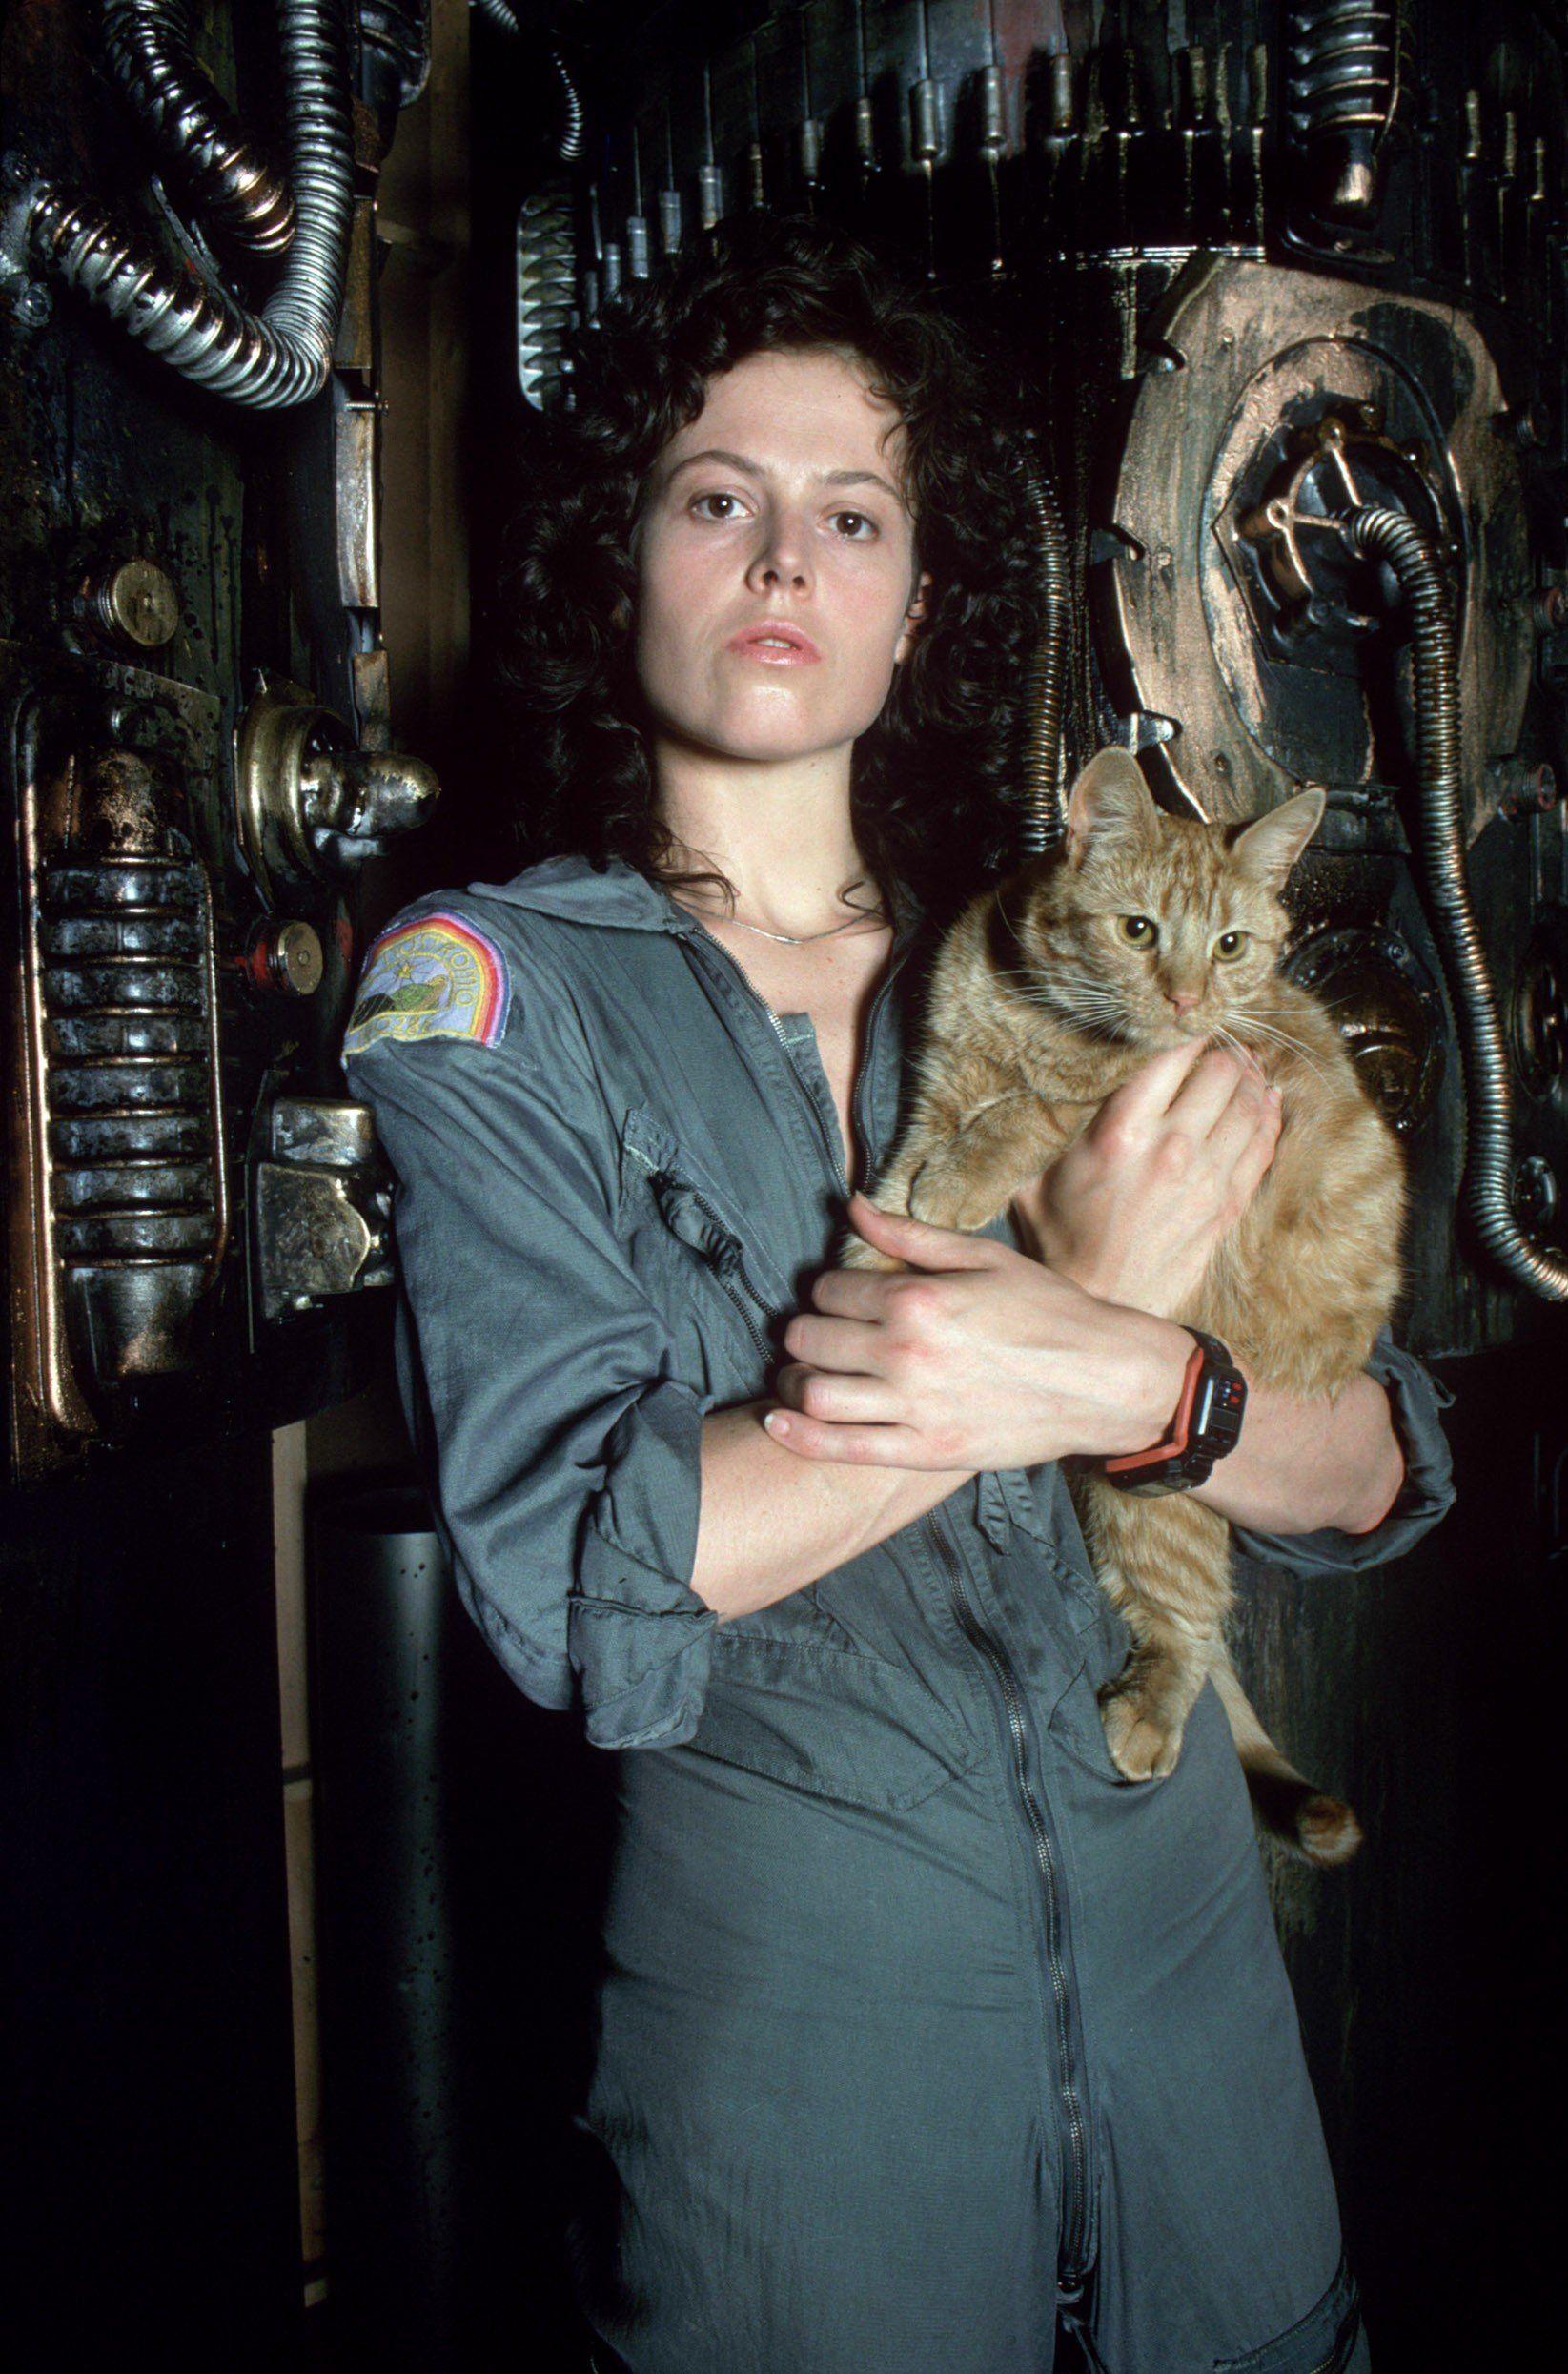 Ellen Ripley From Alien With Images Sigourney Weaver Alien